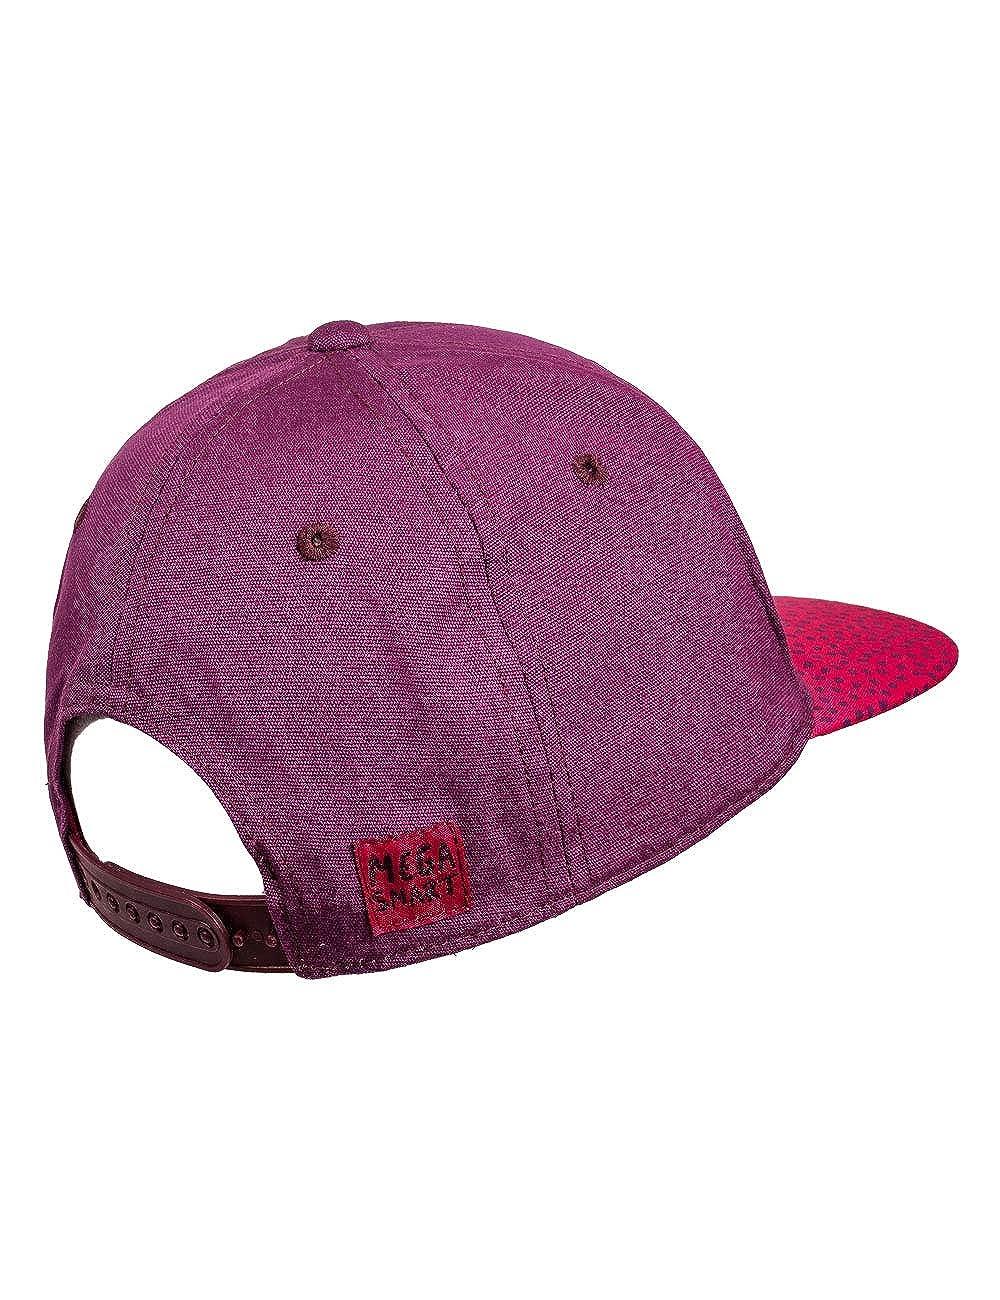 maximo Basecap \Strawberry\ Violet 49//51 Casquette B/éb/é Fille Taille Fabricant: